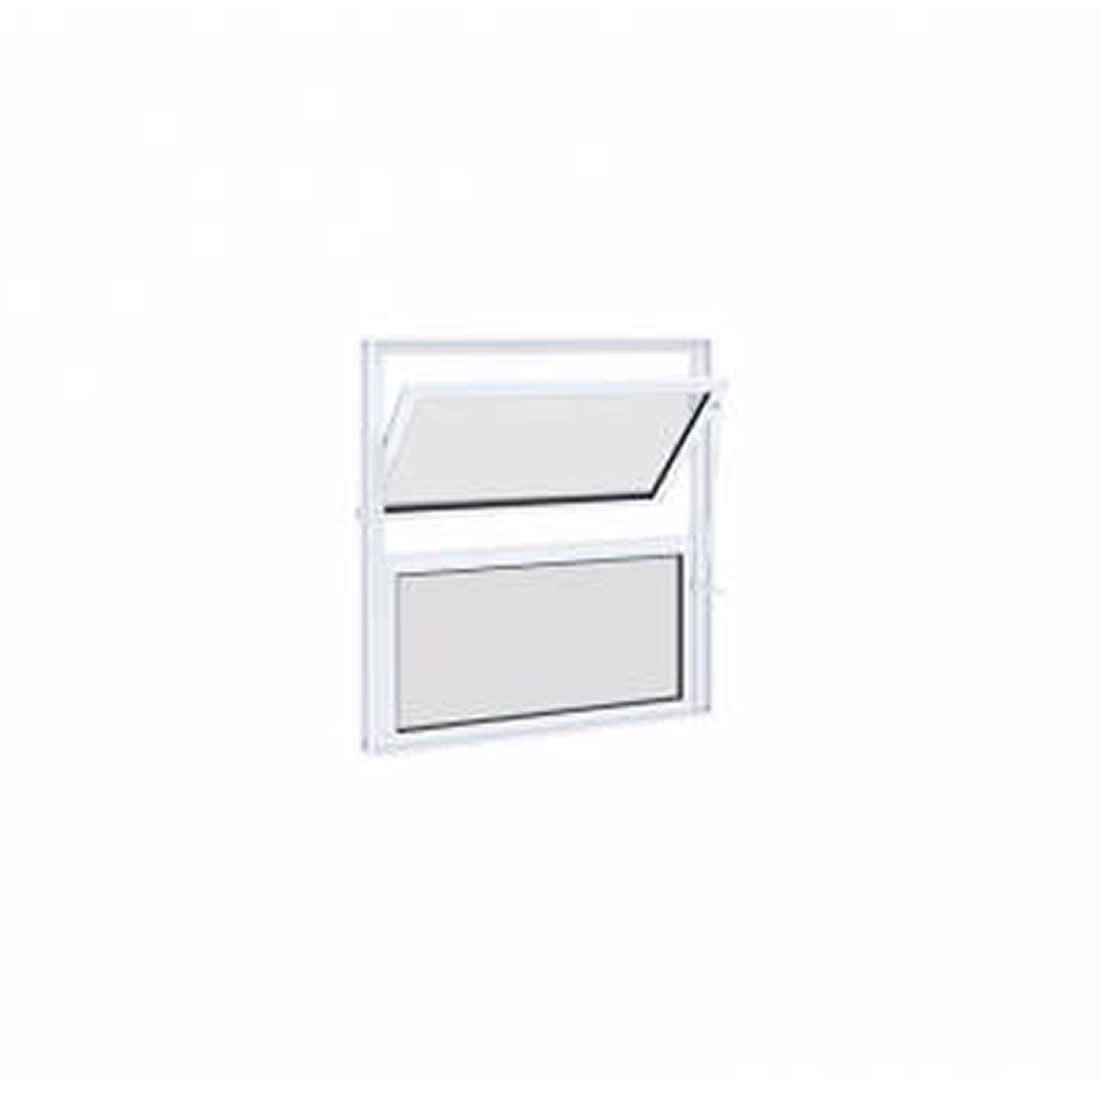 Janela Lucasa Basculante de Alumínio sem Grade 40 X 40 cm Ref 9415.0